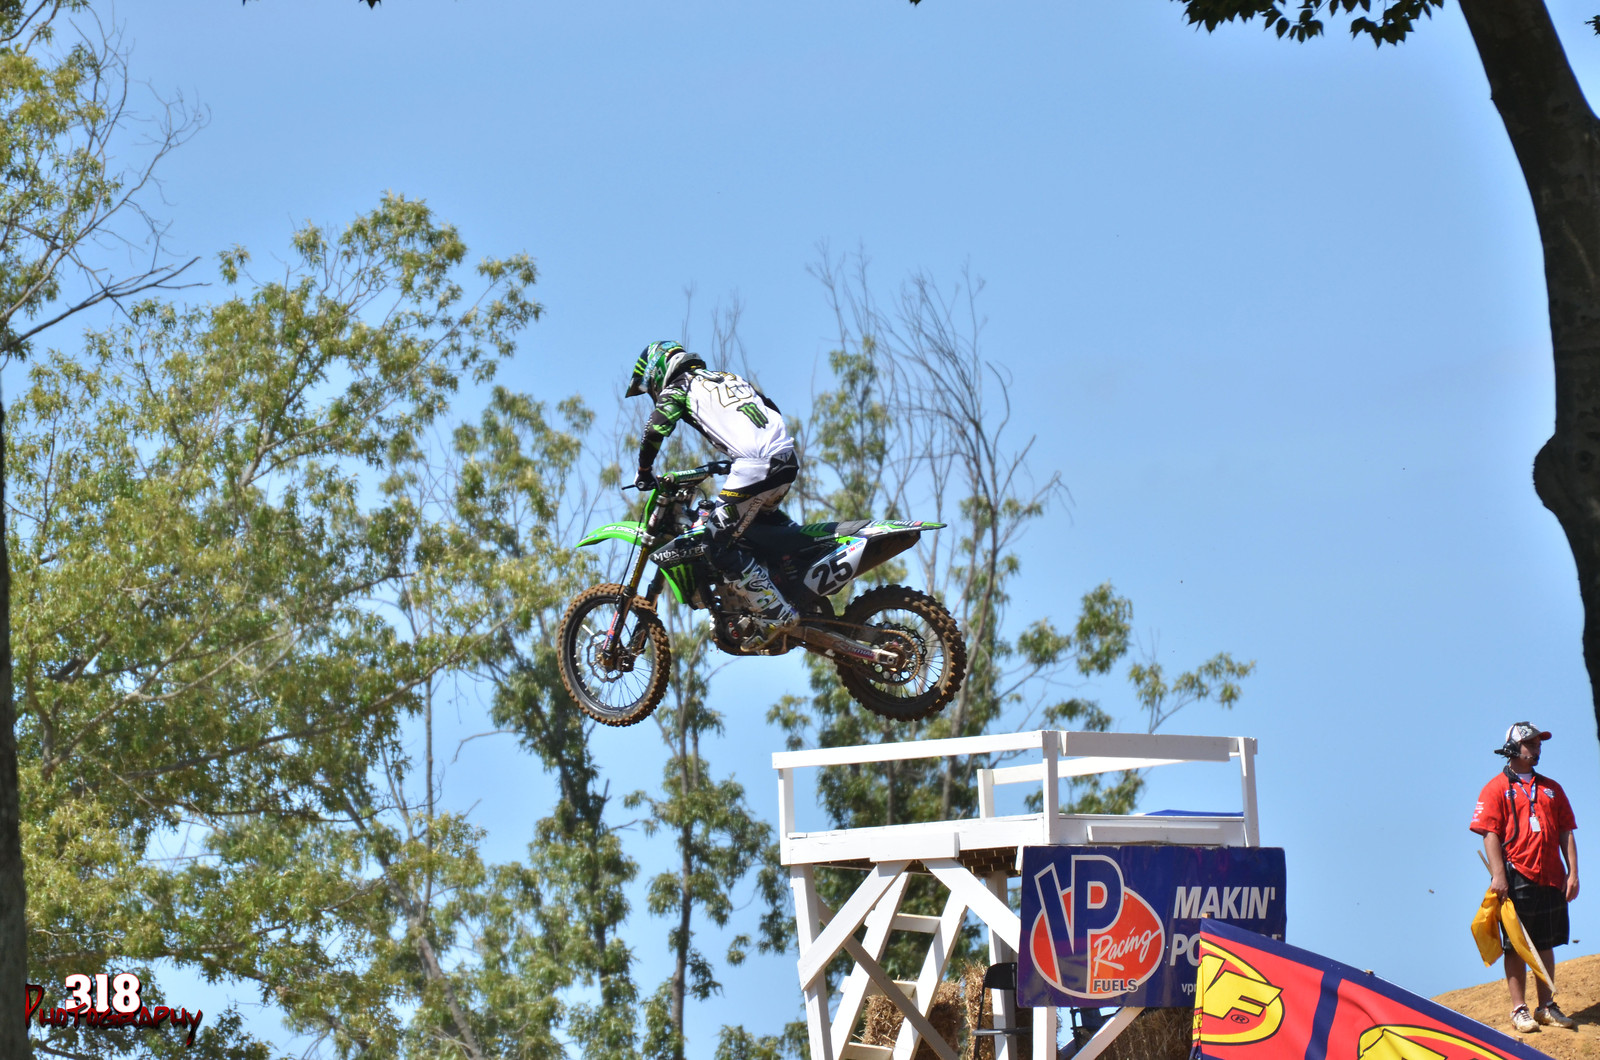 25-02 - MxPro318 - Motocross Pictures - Vital MX